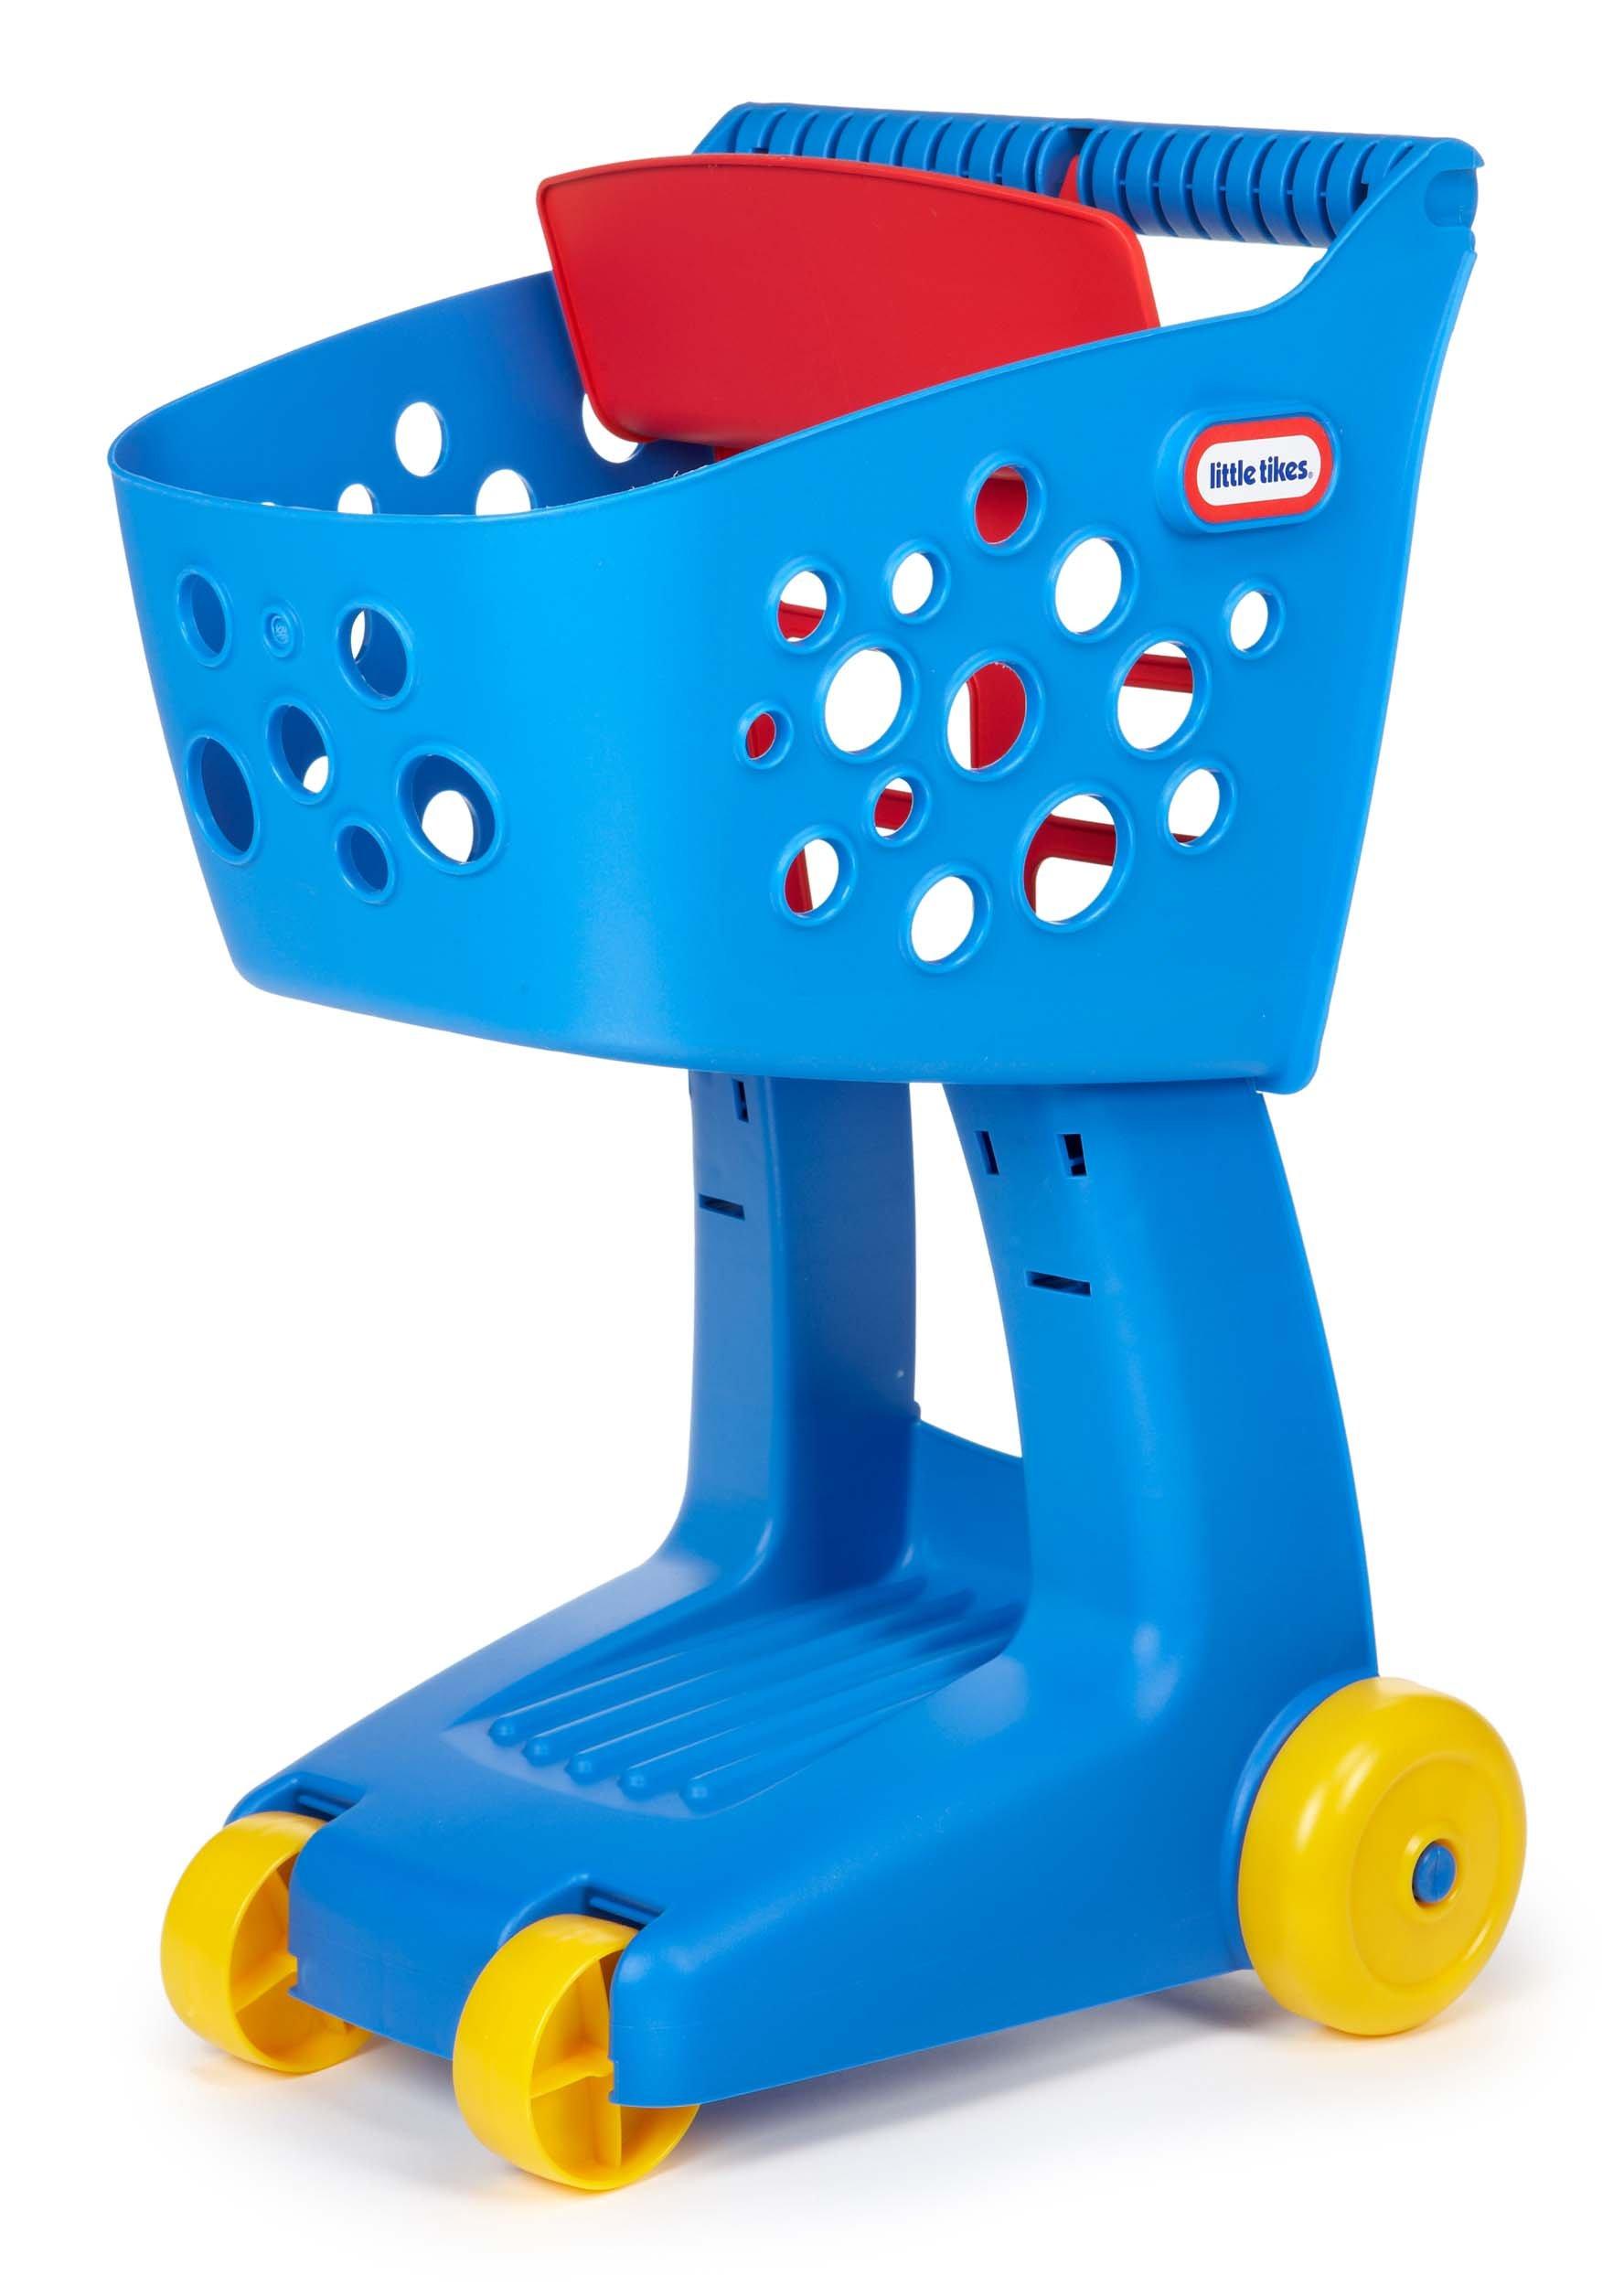 Little Tikes Lil' Shopper - Blue